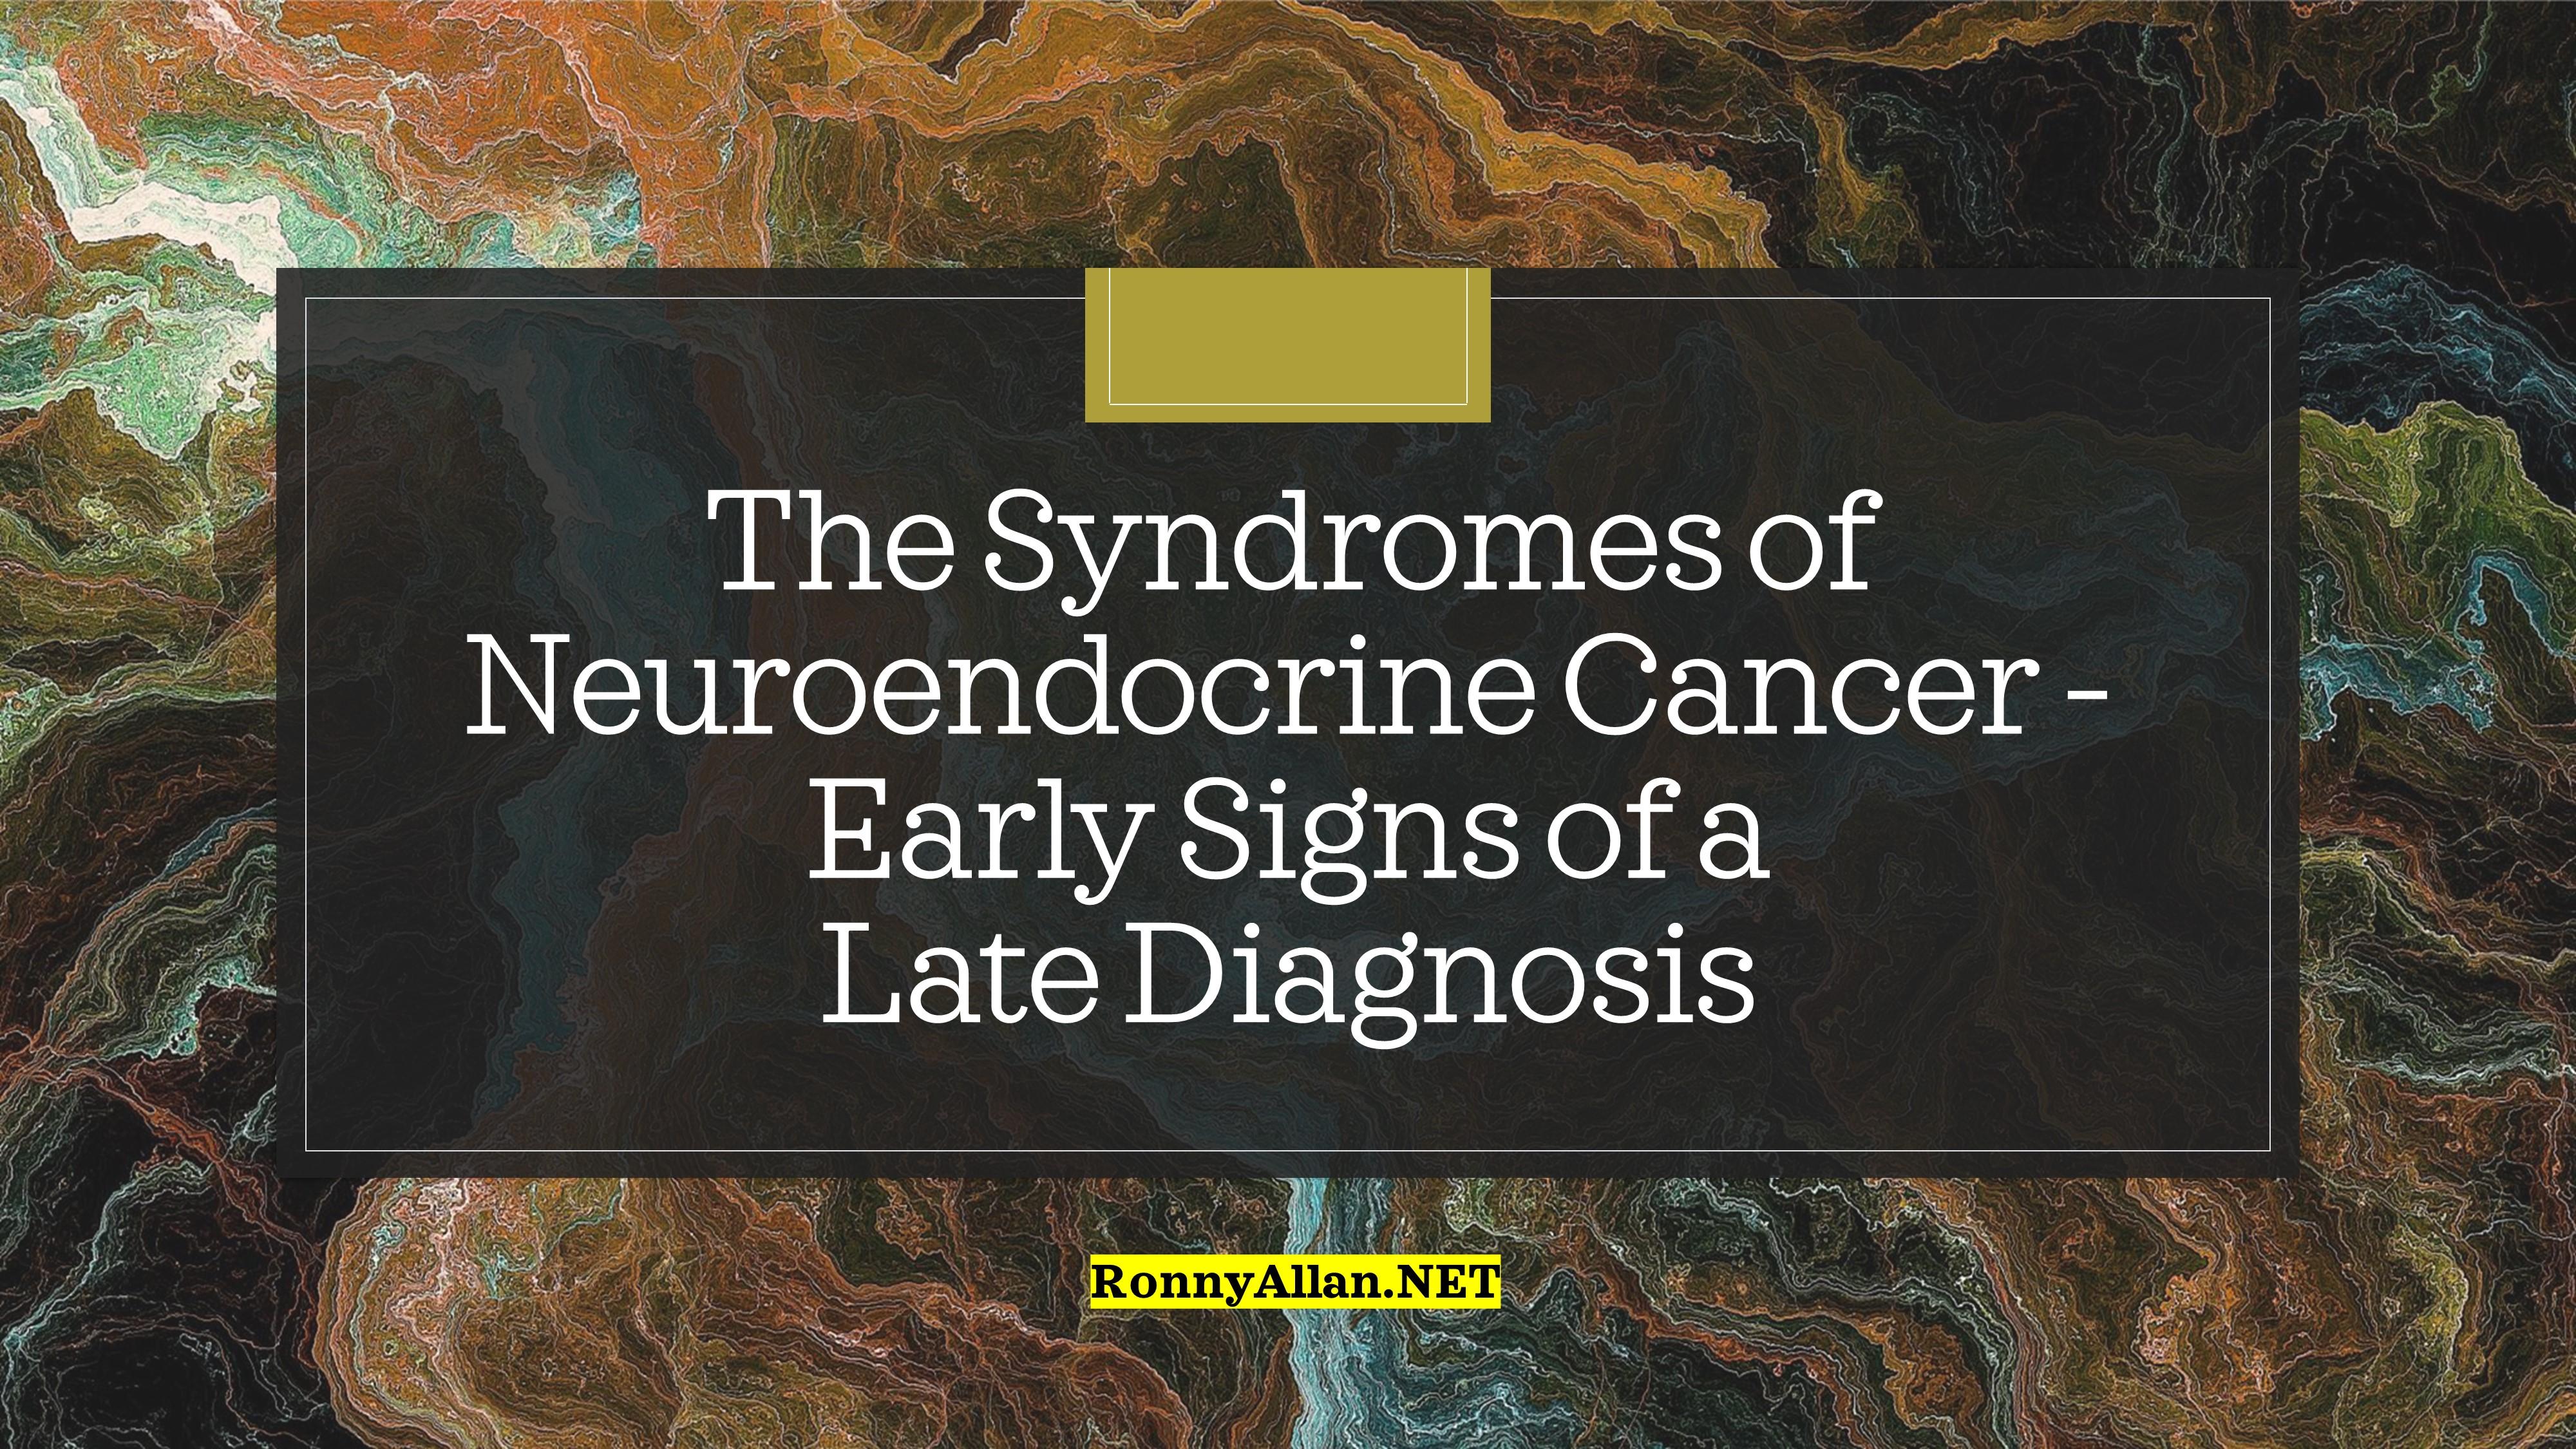 neuroendocrine cancer book)